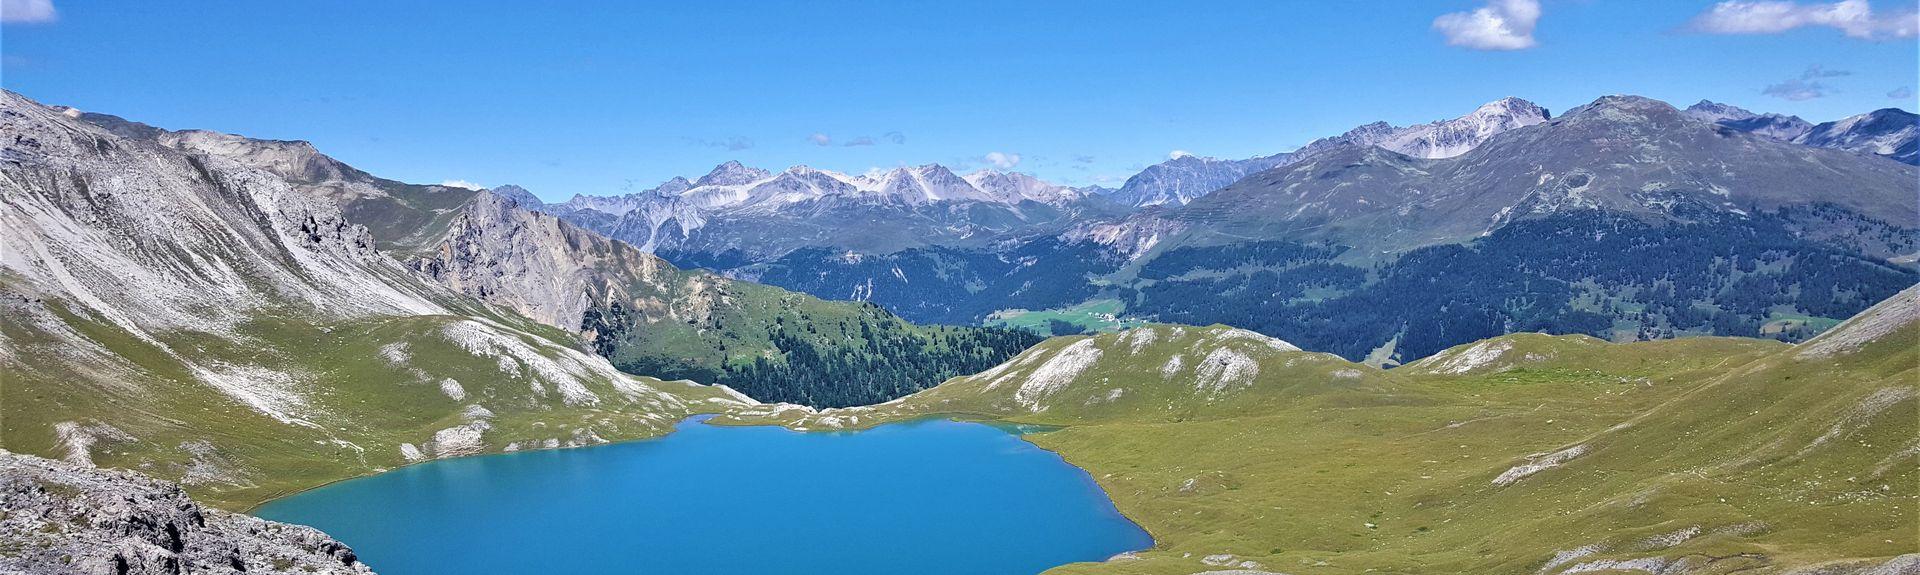 Canton of Grisons, Switzerland